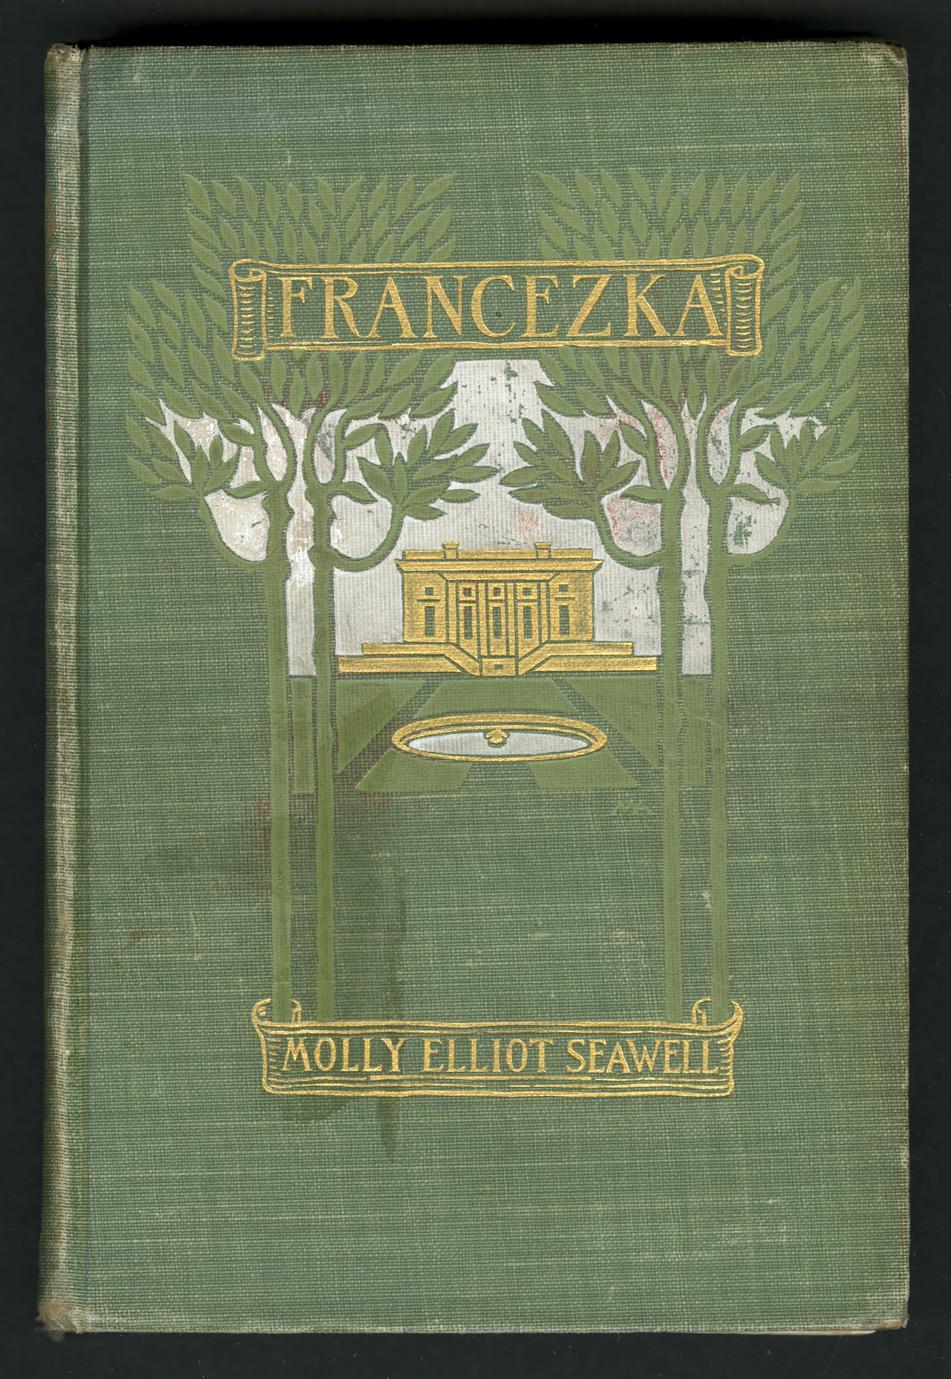 Francezka (1 of 2)